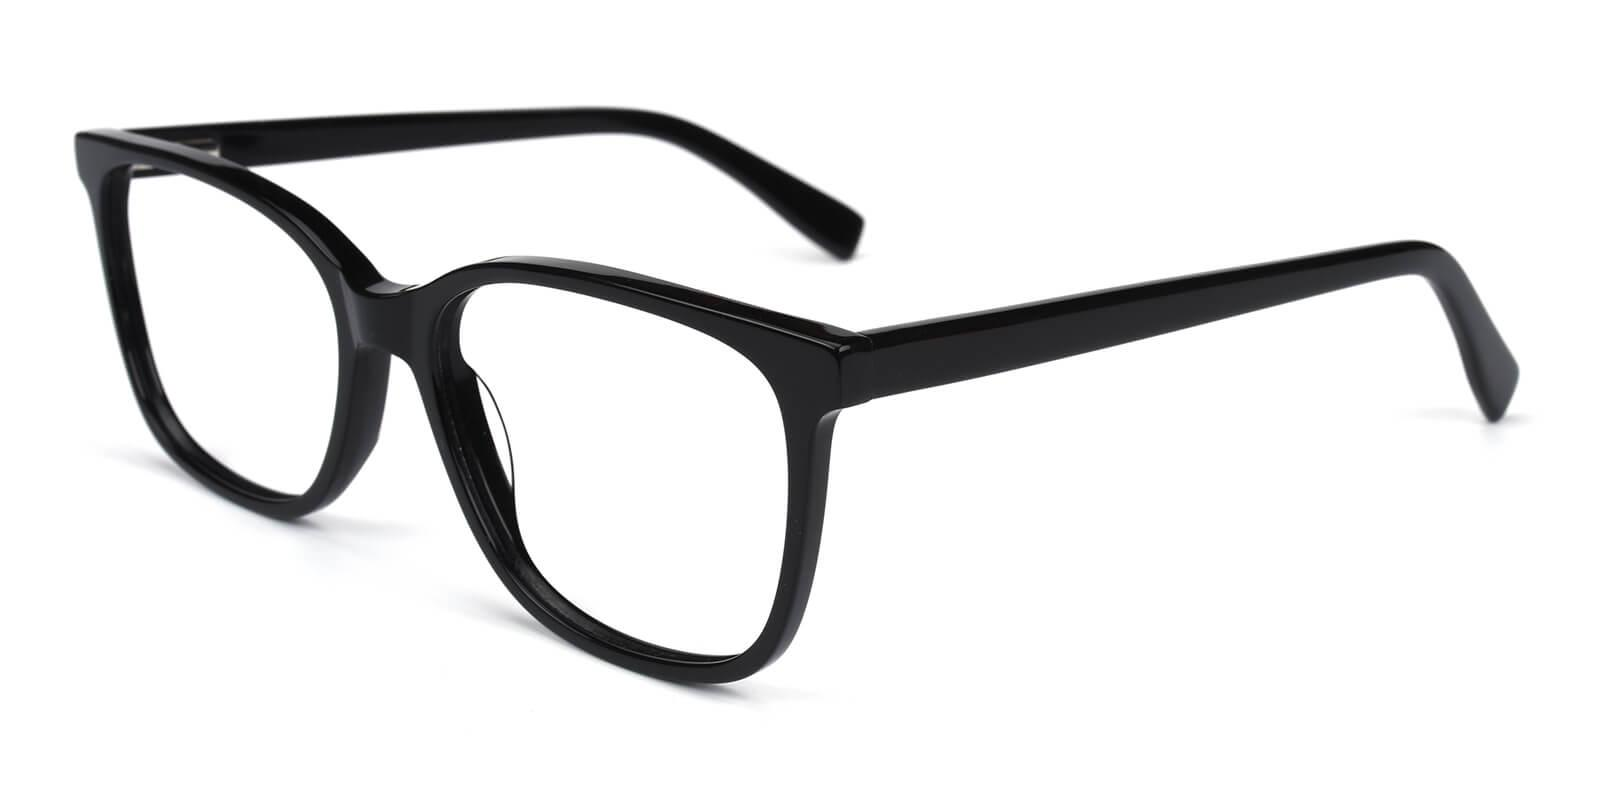 Defeny-Black-Square-Acetate-Eyeglasses-additional1